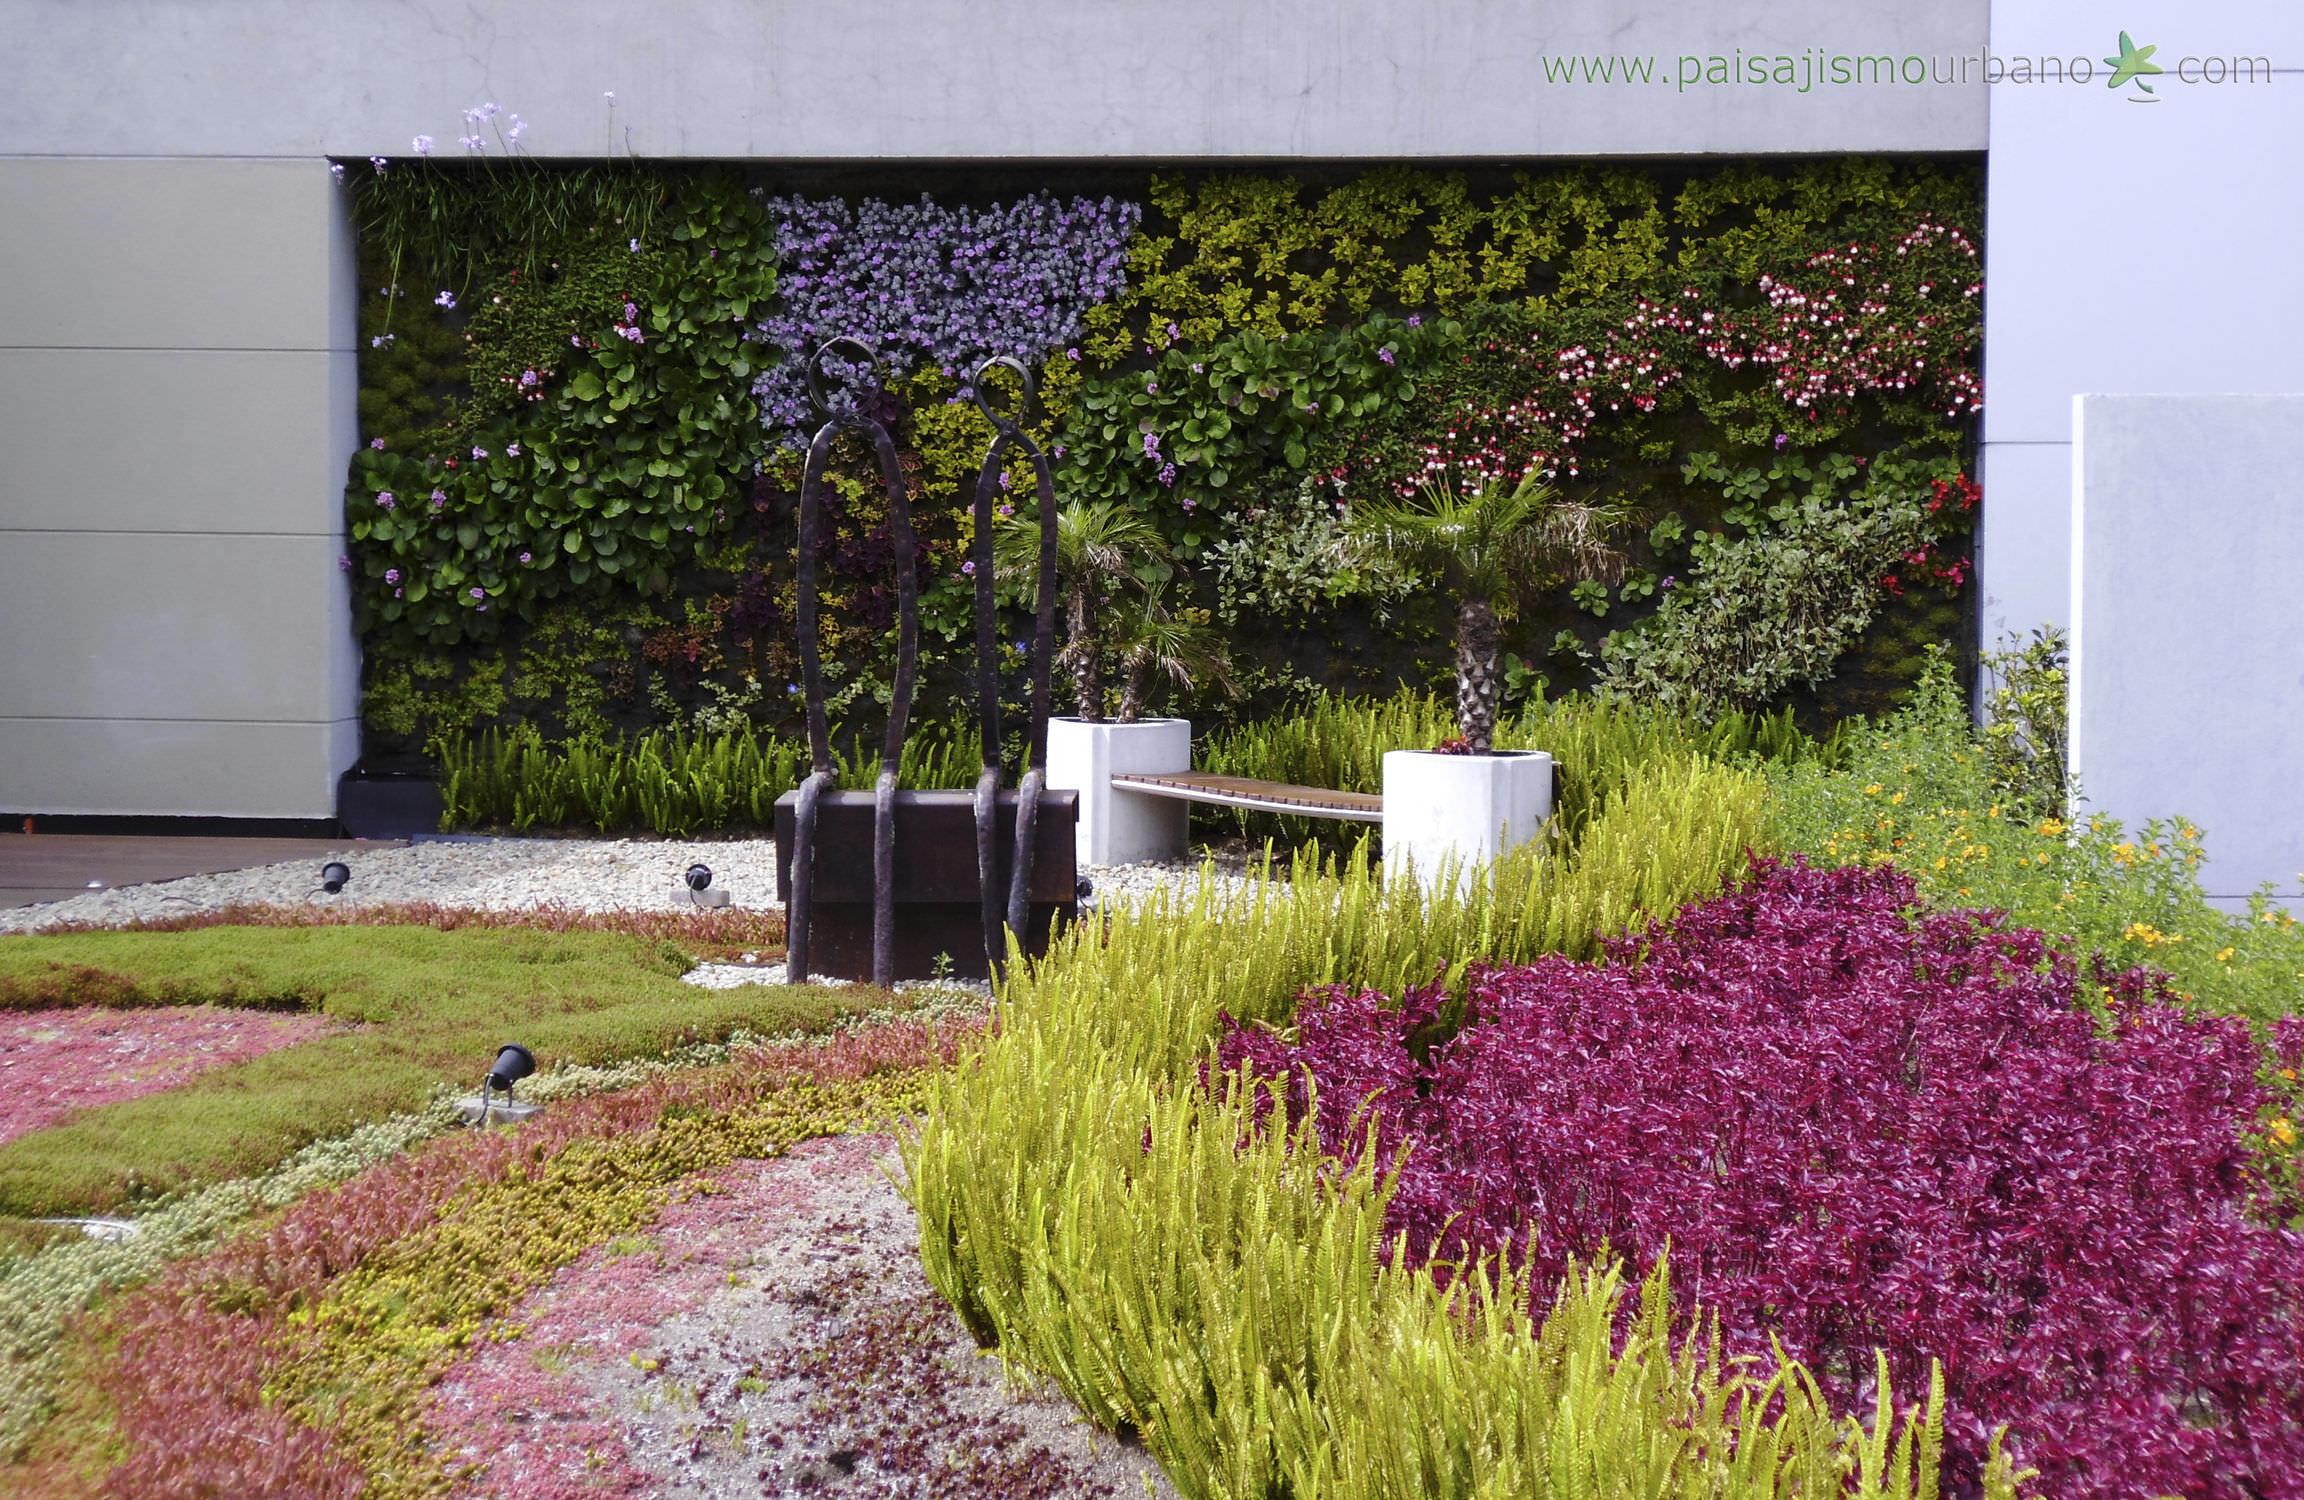 exterior green facade jardin vertical biomax paisajismo urbano